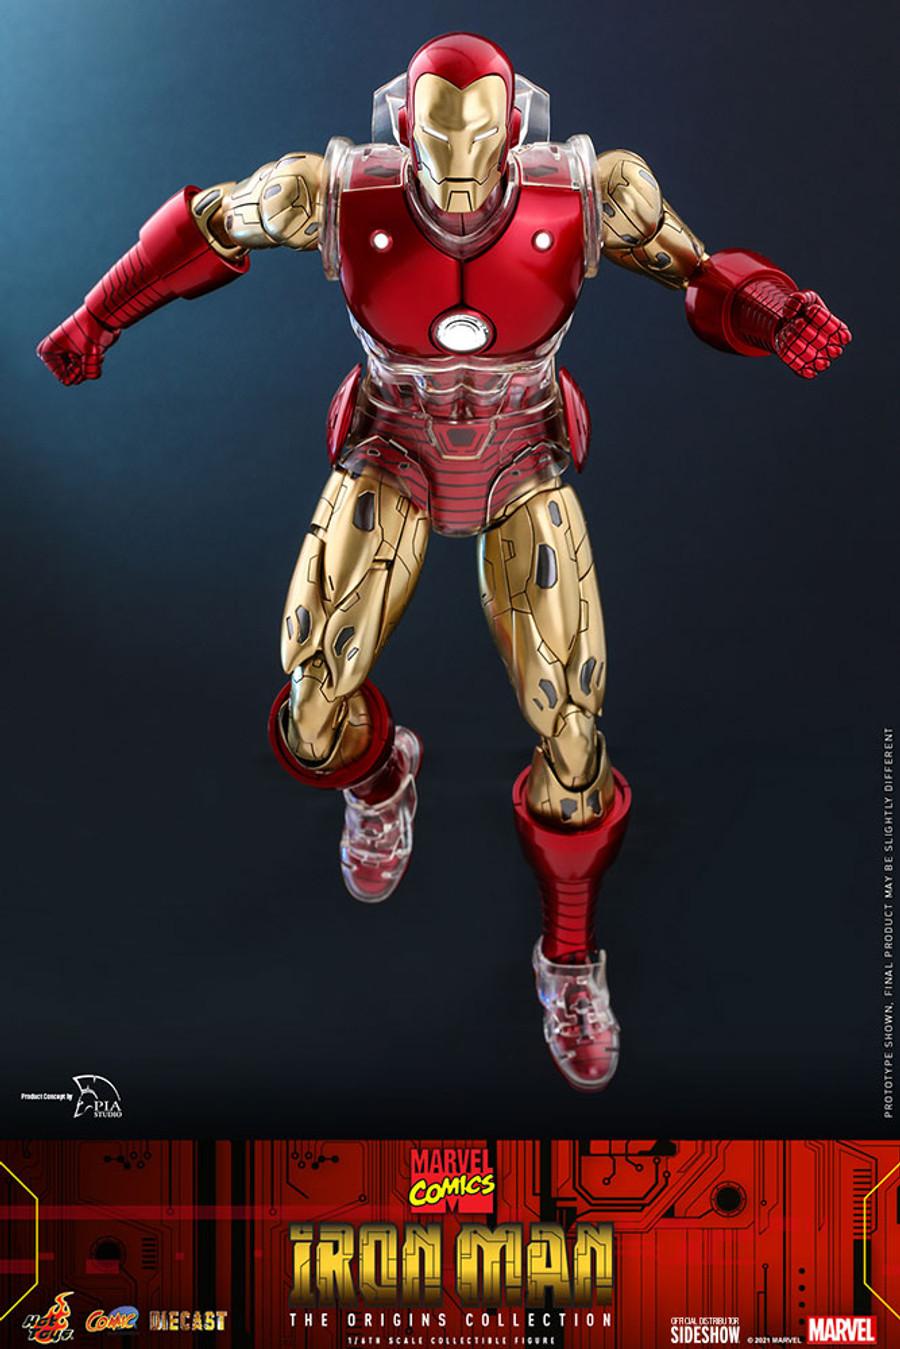 Hot Toys - Marvel Comics The Origin Collection: Iron Man